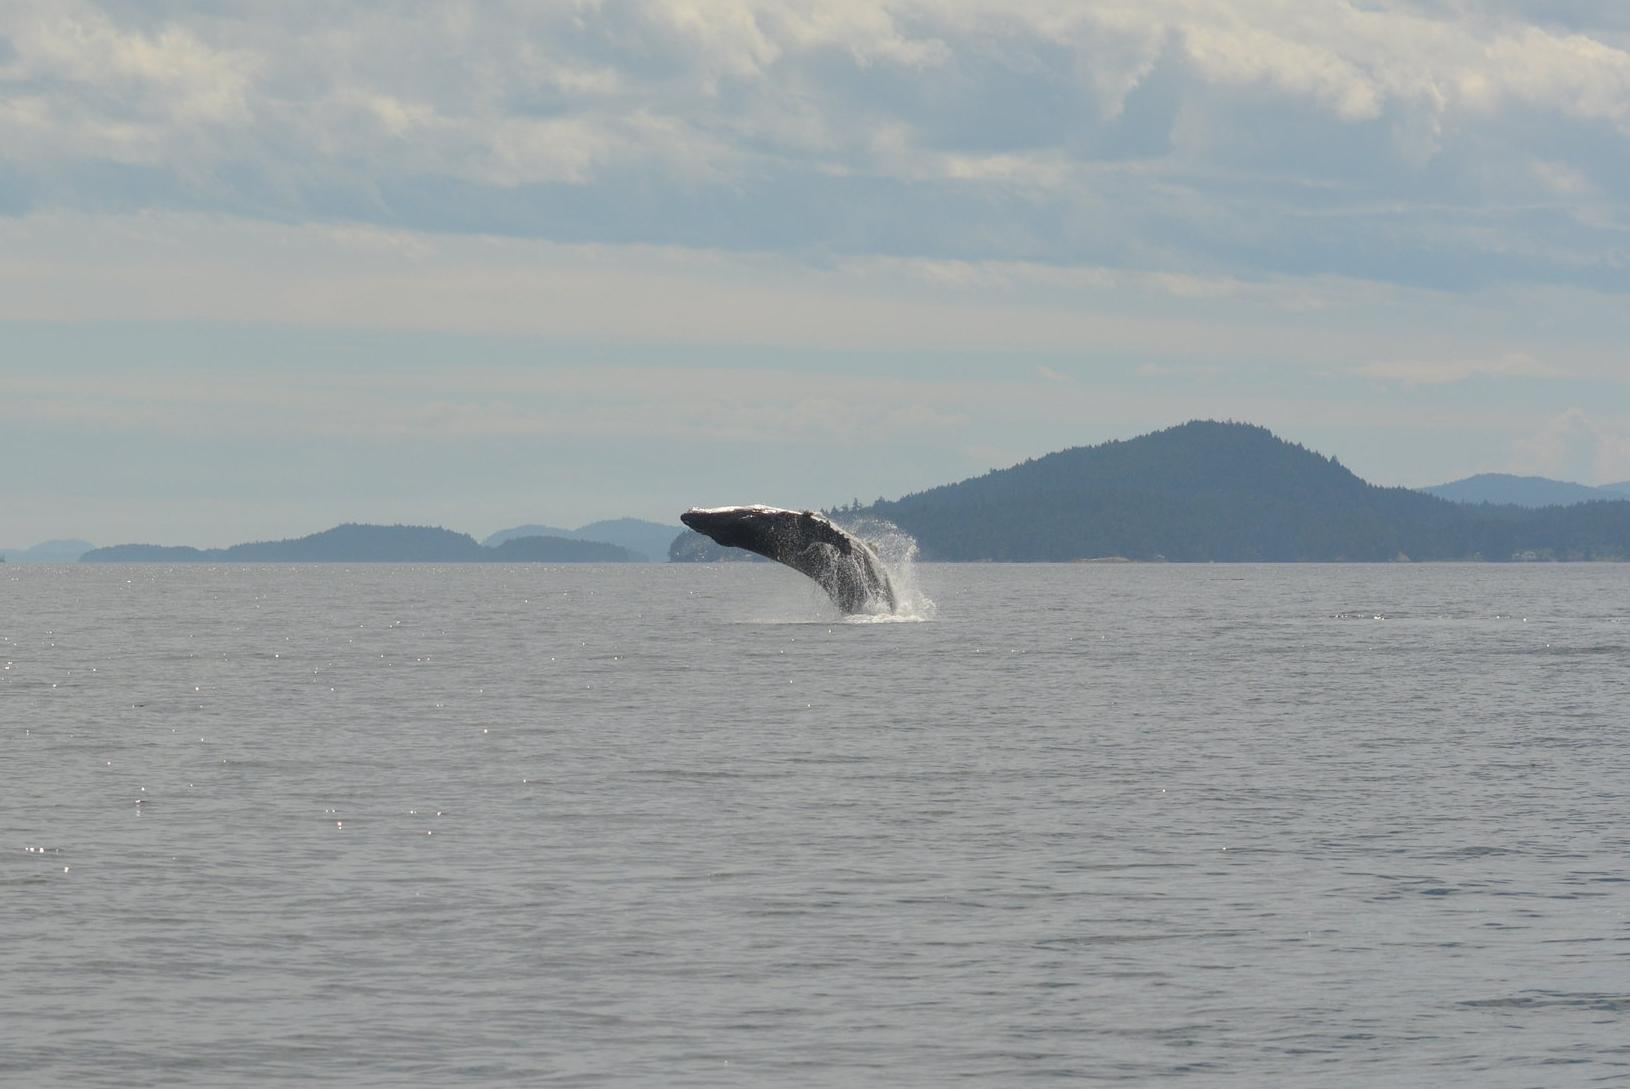 Humpback breaching! Photo by Val Watson.